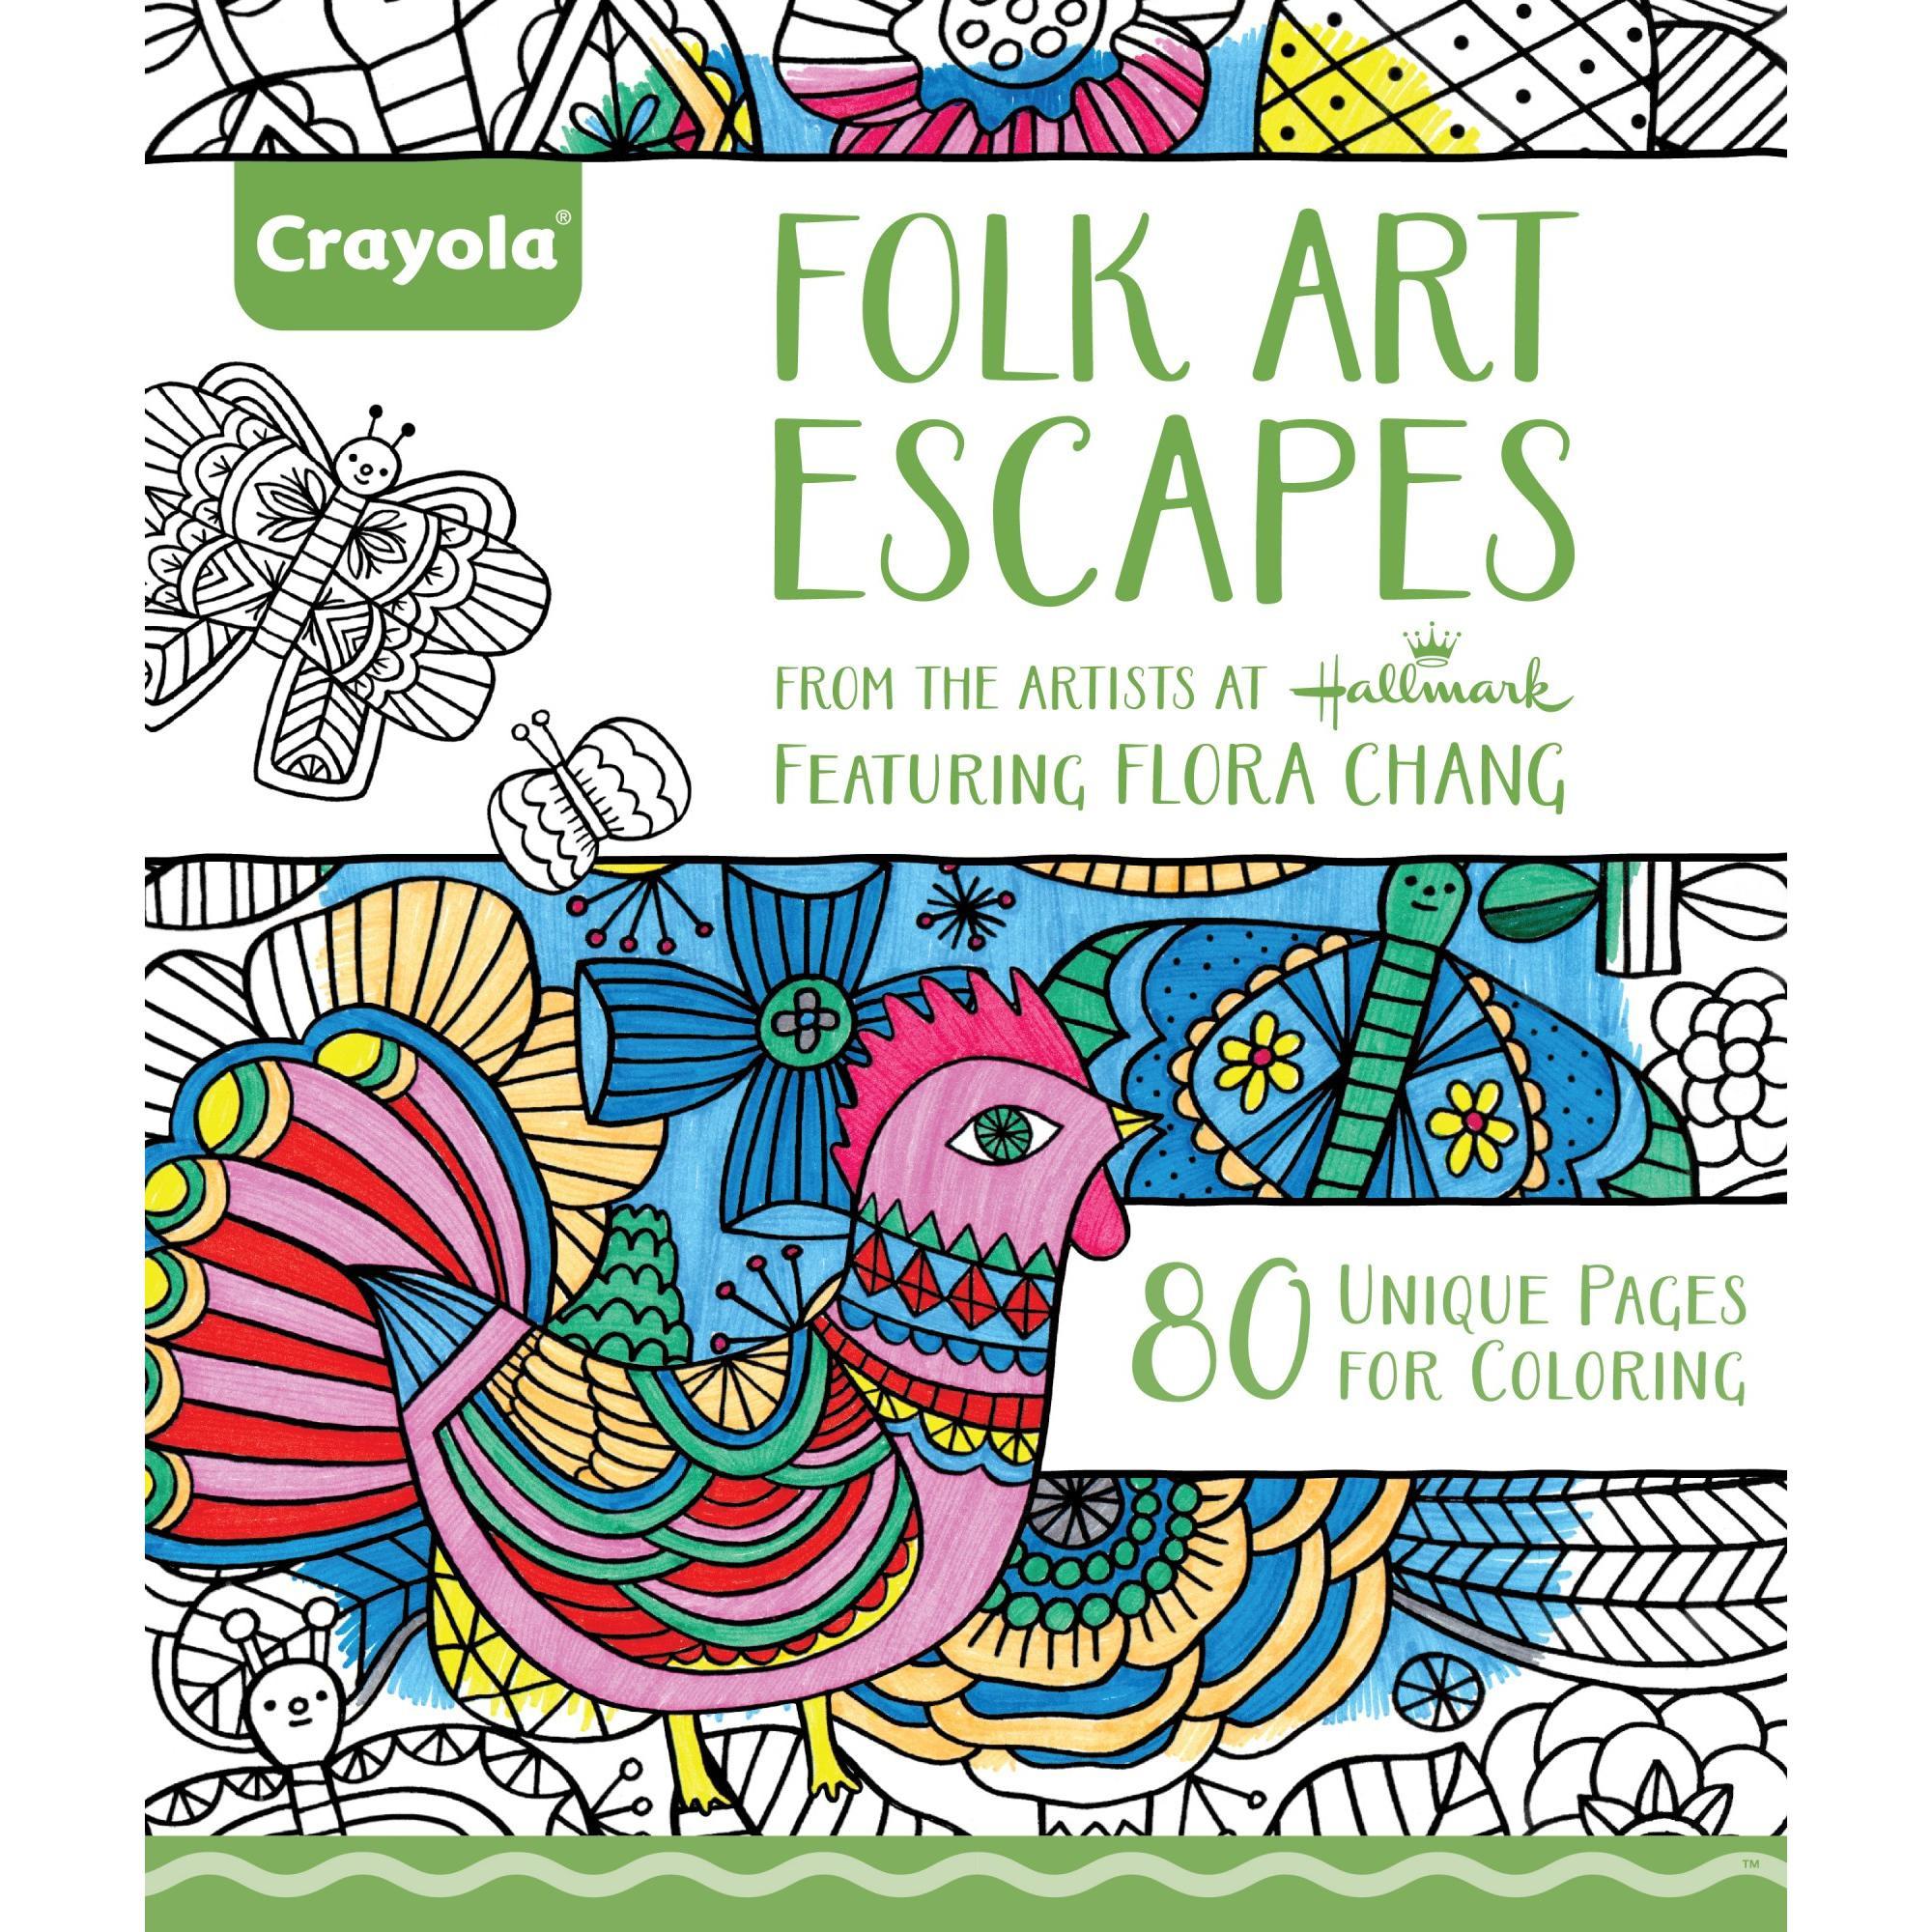 Adult Coloring Books Walmart  Crayola Adult Coloring Book Bundle Folk Art Escapes and